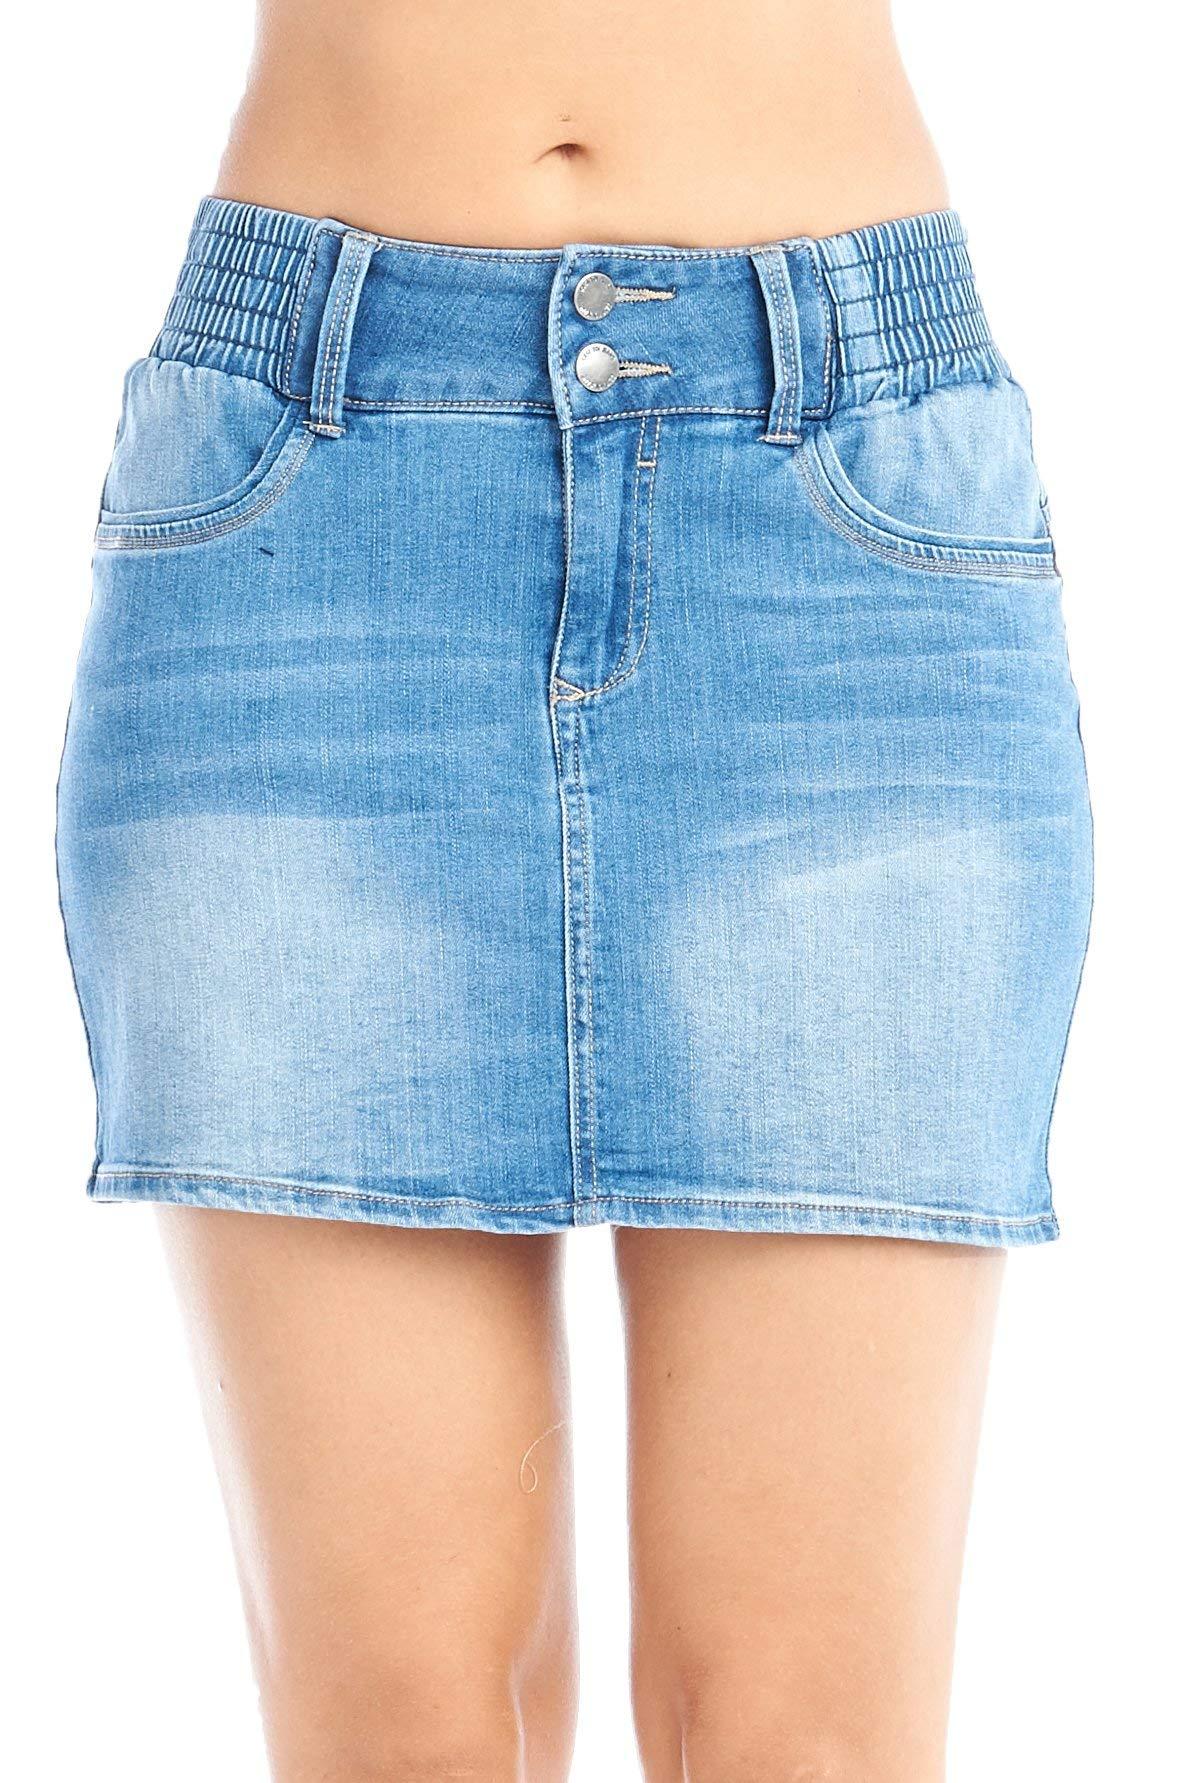 Khanomak Women's High-Rise Casual Basic 2 Button Front Elastic Waist Denim Jean Body Con Mini Skirt (Medium, Light Blue)